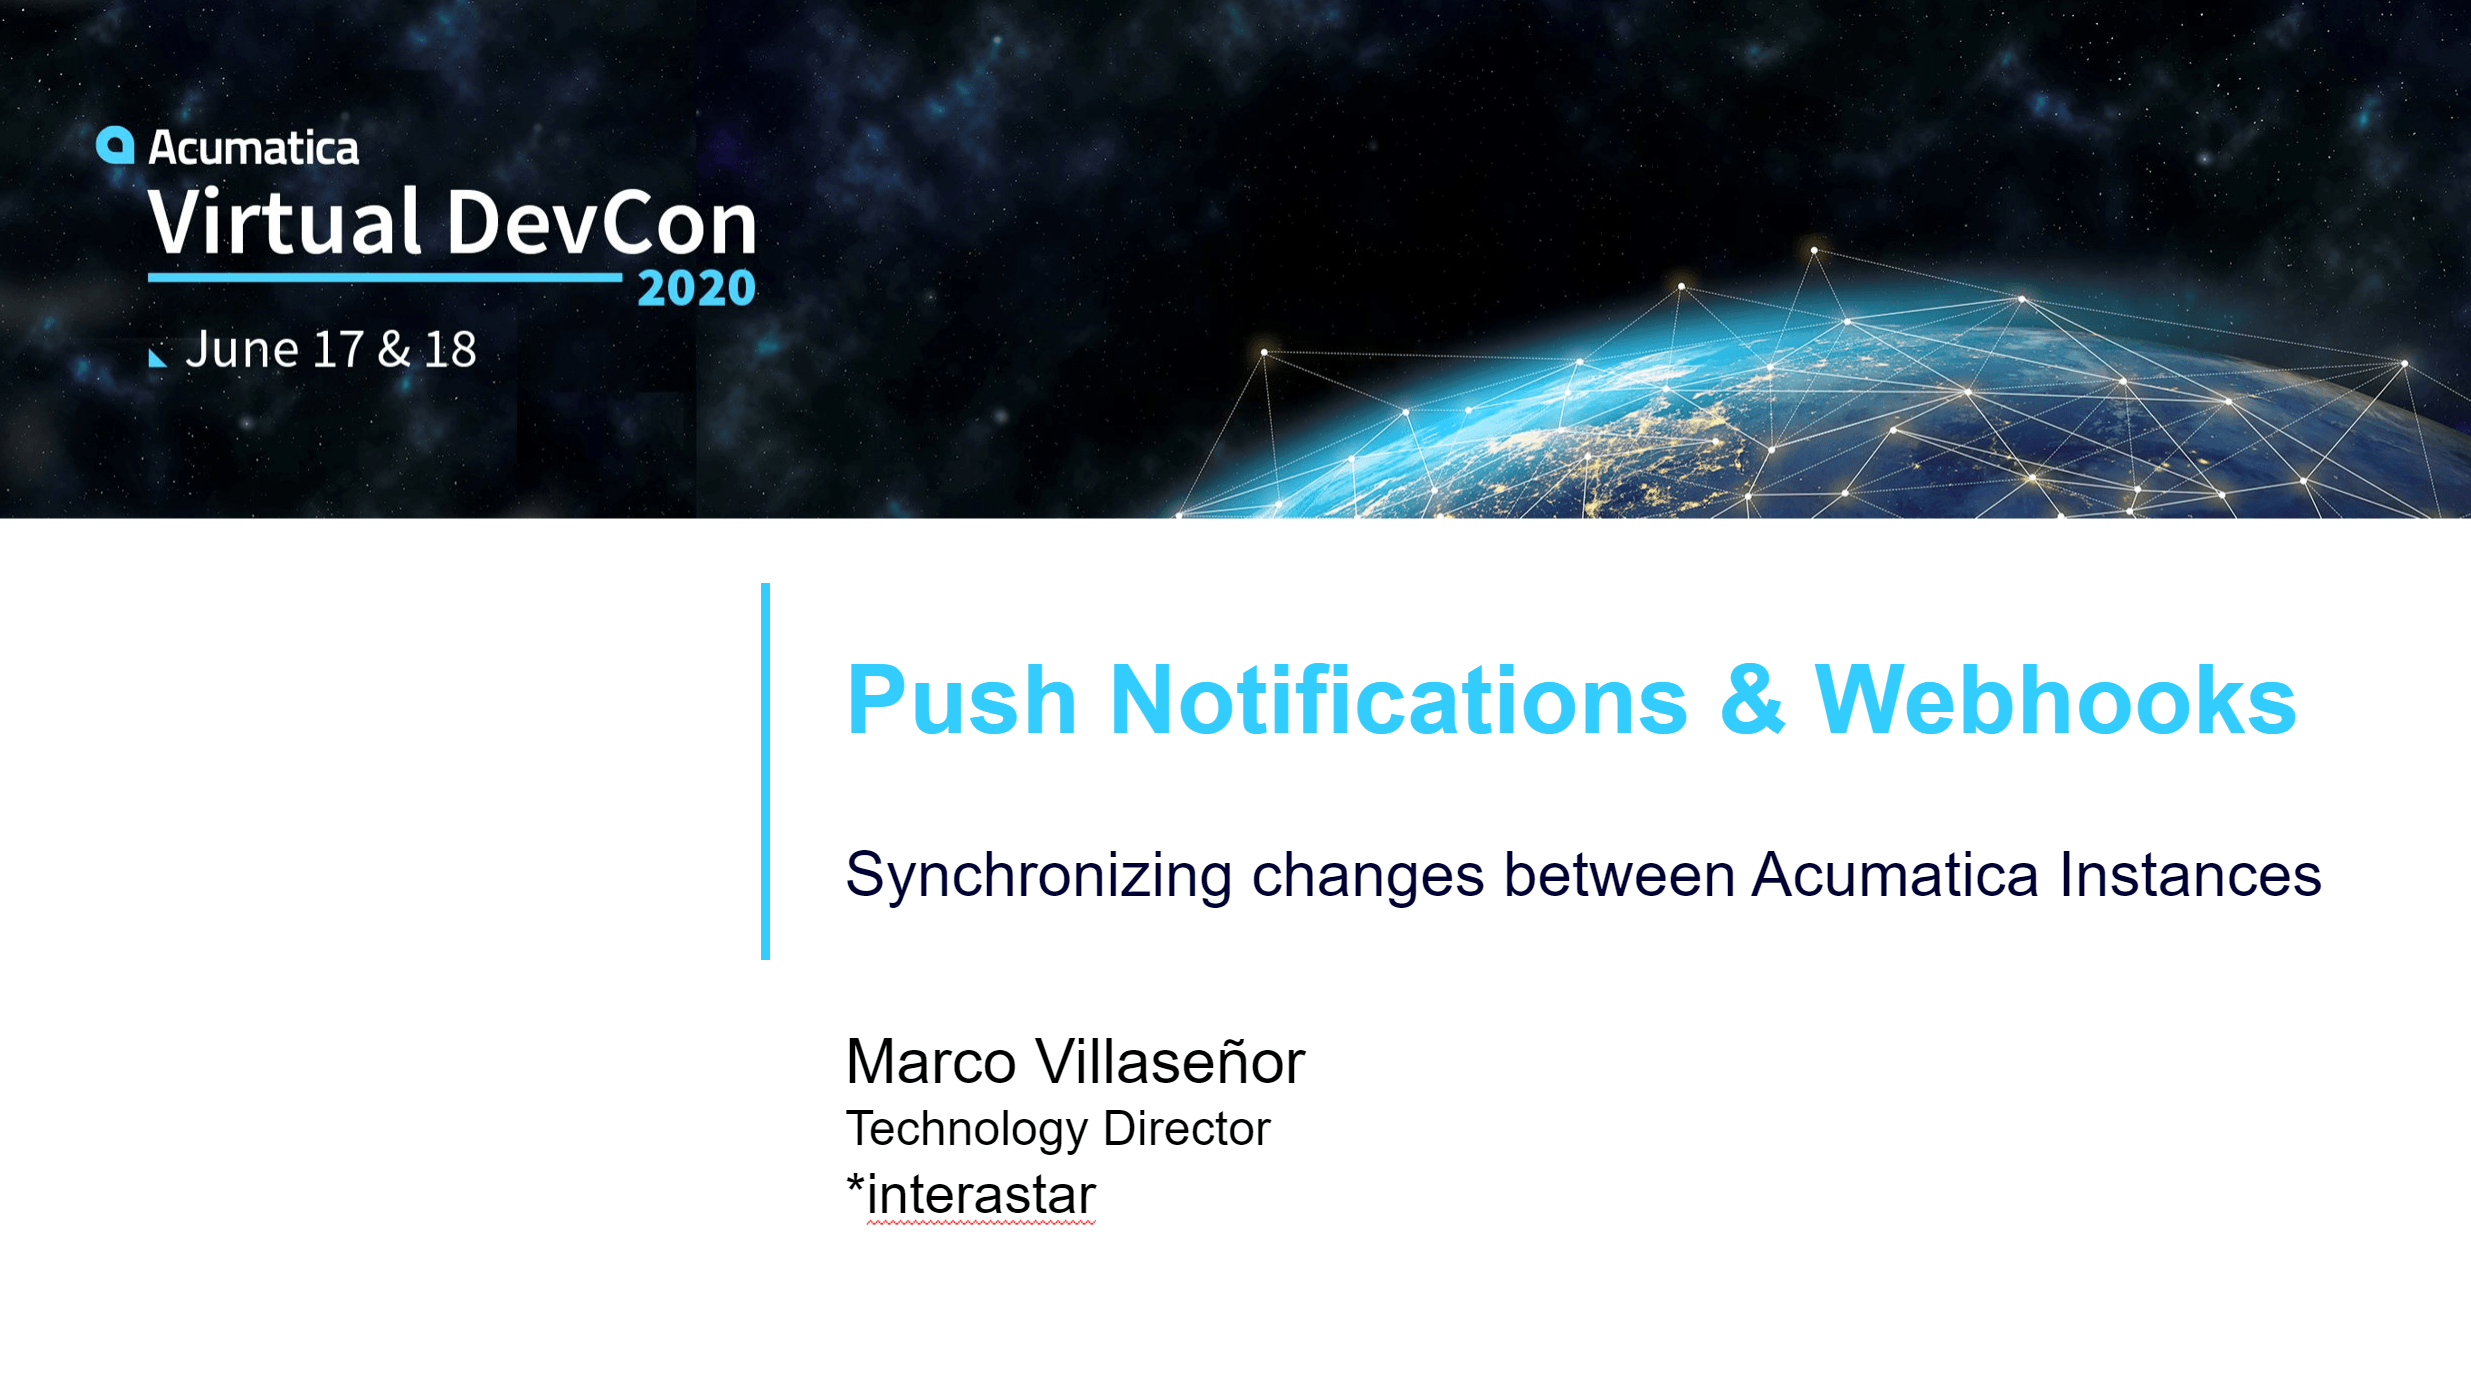 DevCon 2020 - Push Notifications & Webhooks: Synchronizing changes between Acumatica Instances